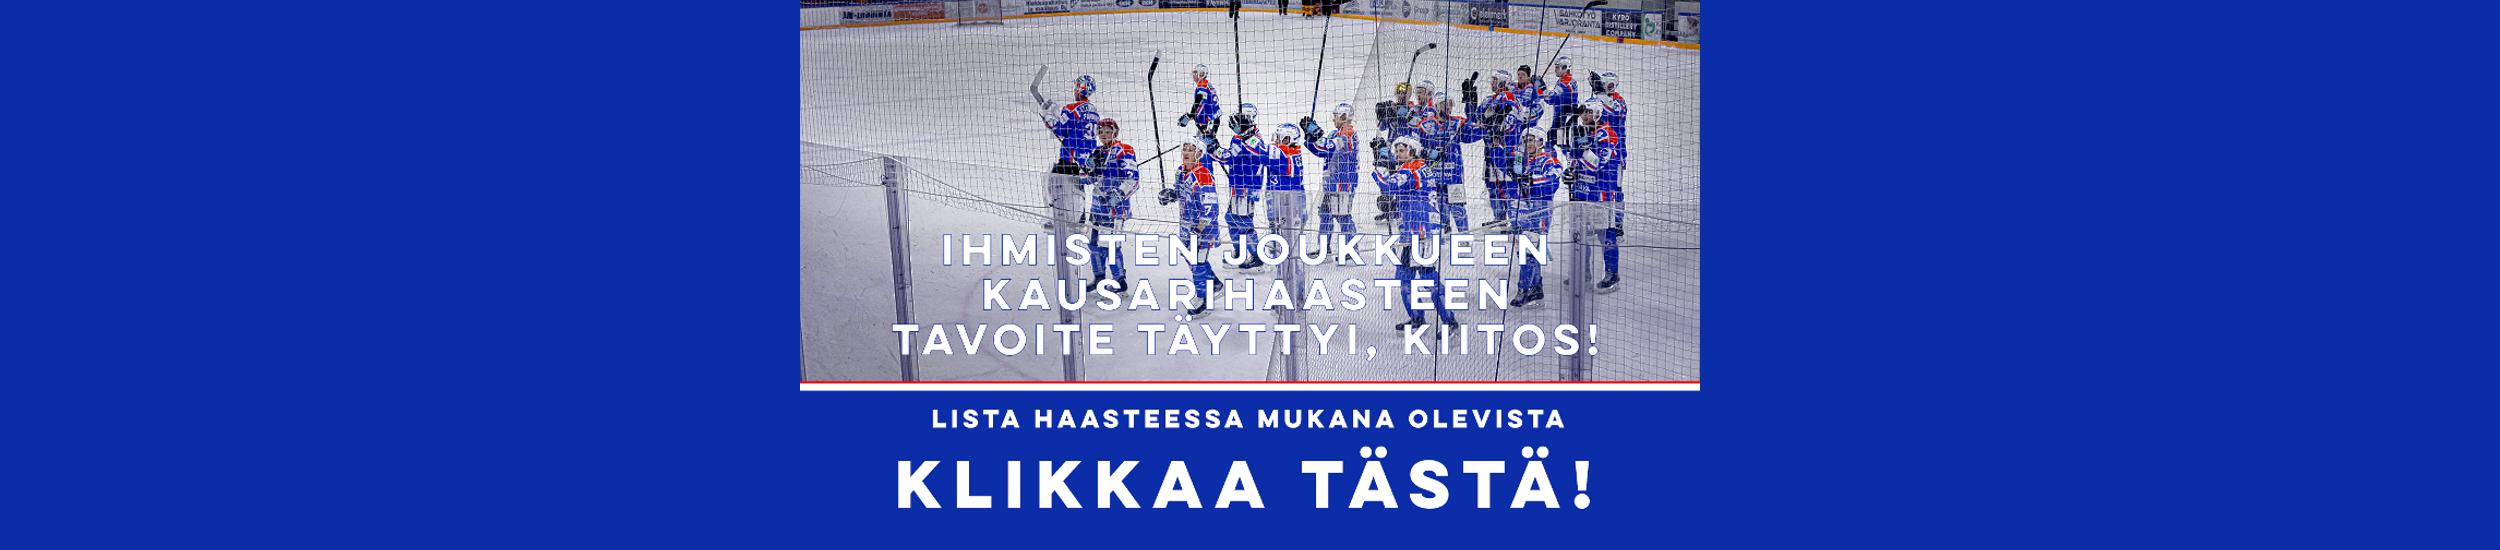 kausarihaaste_lista